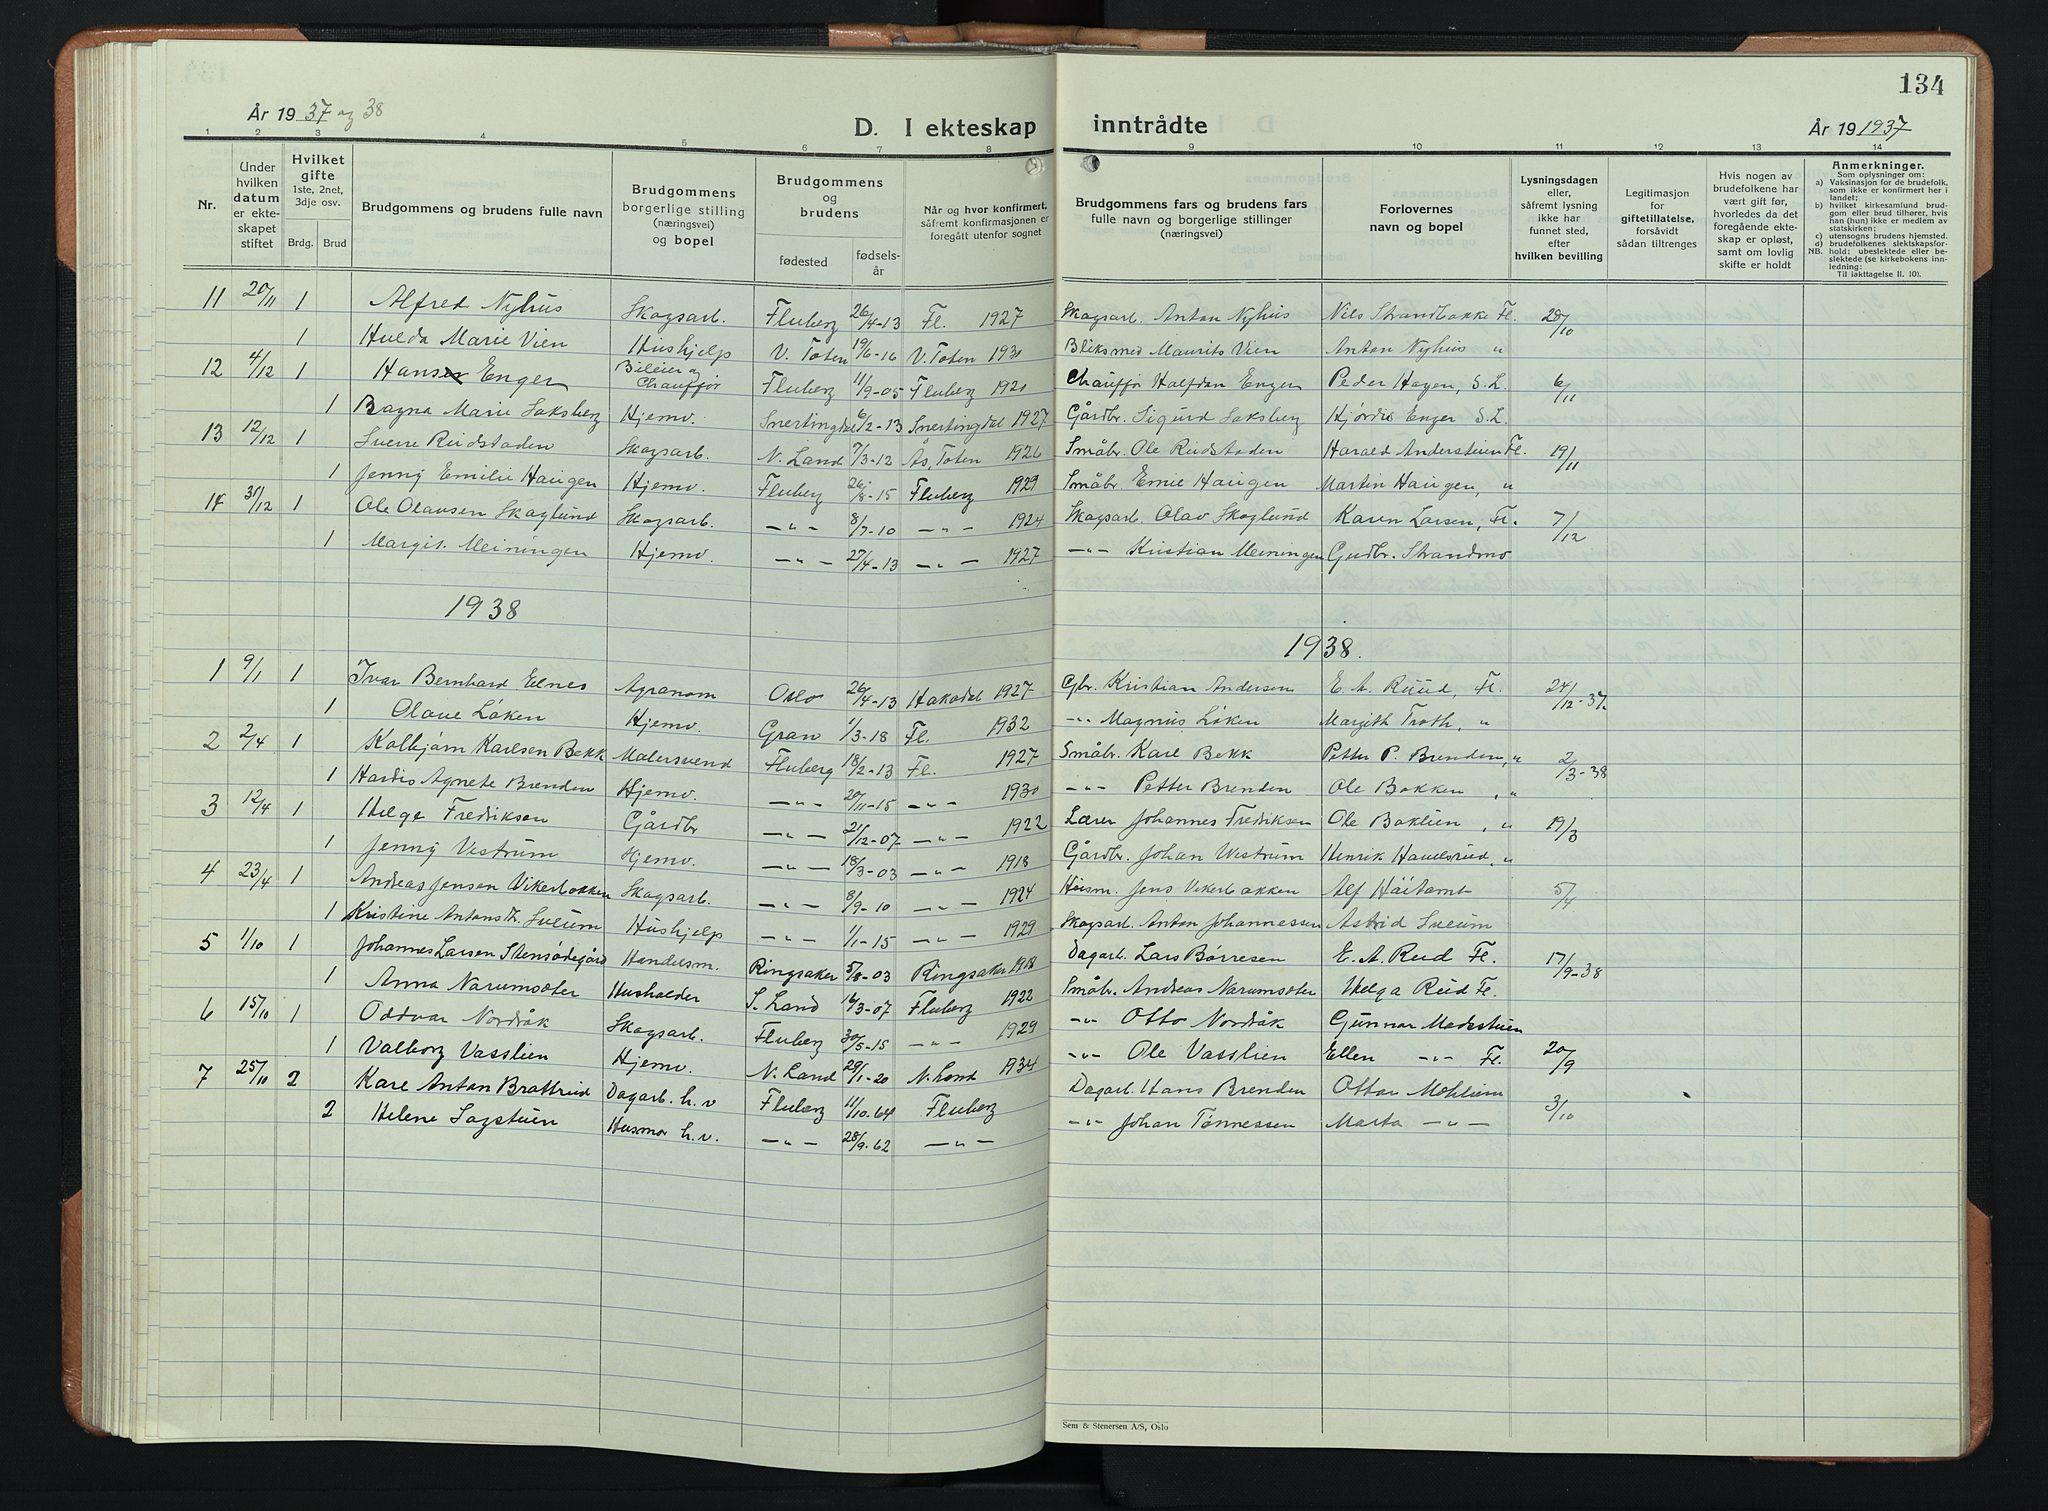 SAH, Søndre Land prestekontor, L/L0008: Klokkerbok nr. 8, 1926-1950, s. 134